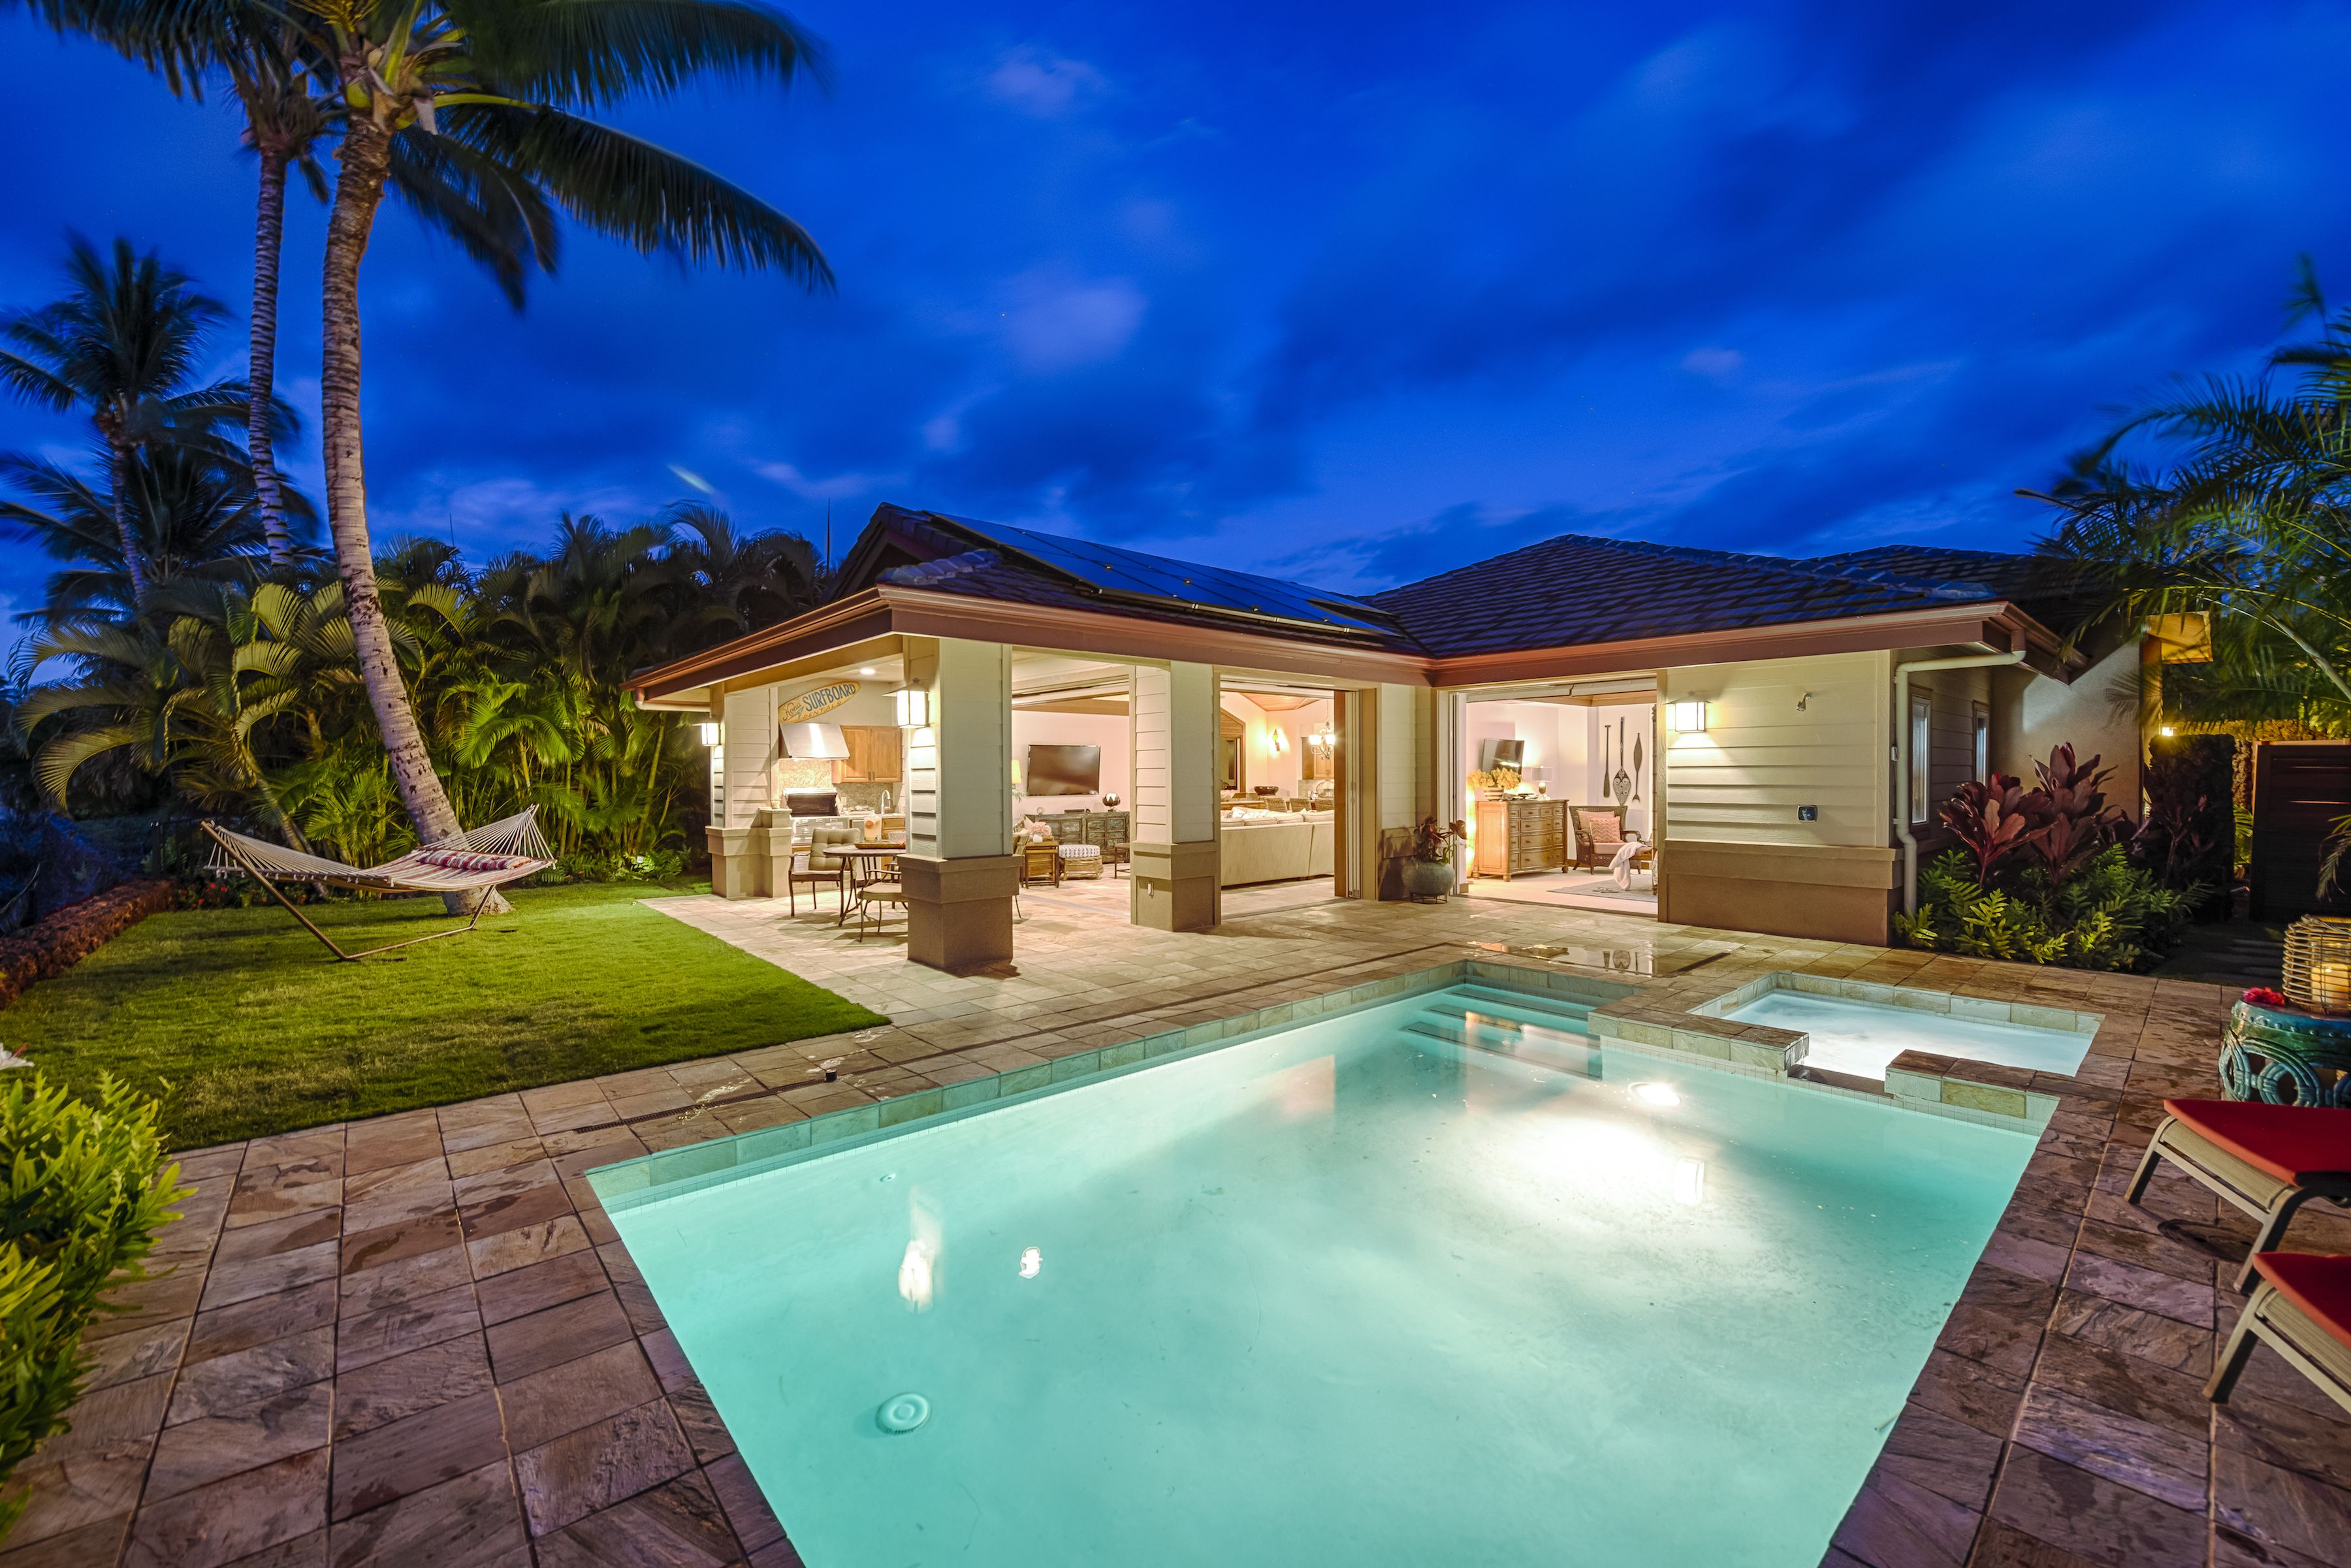 Fairmont orchid pool luxury vacation rentals luxury